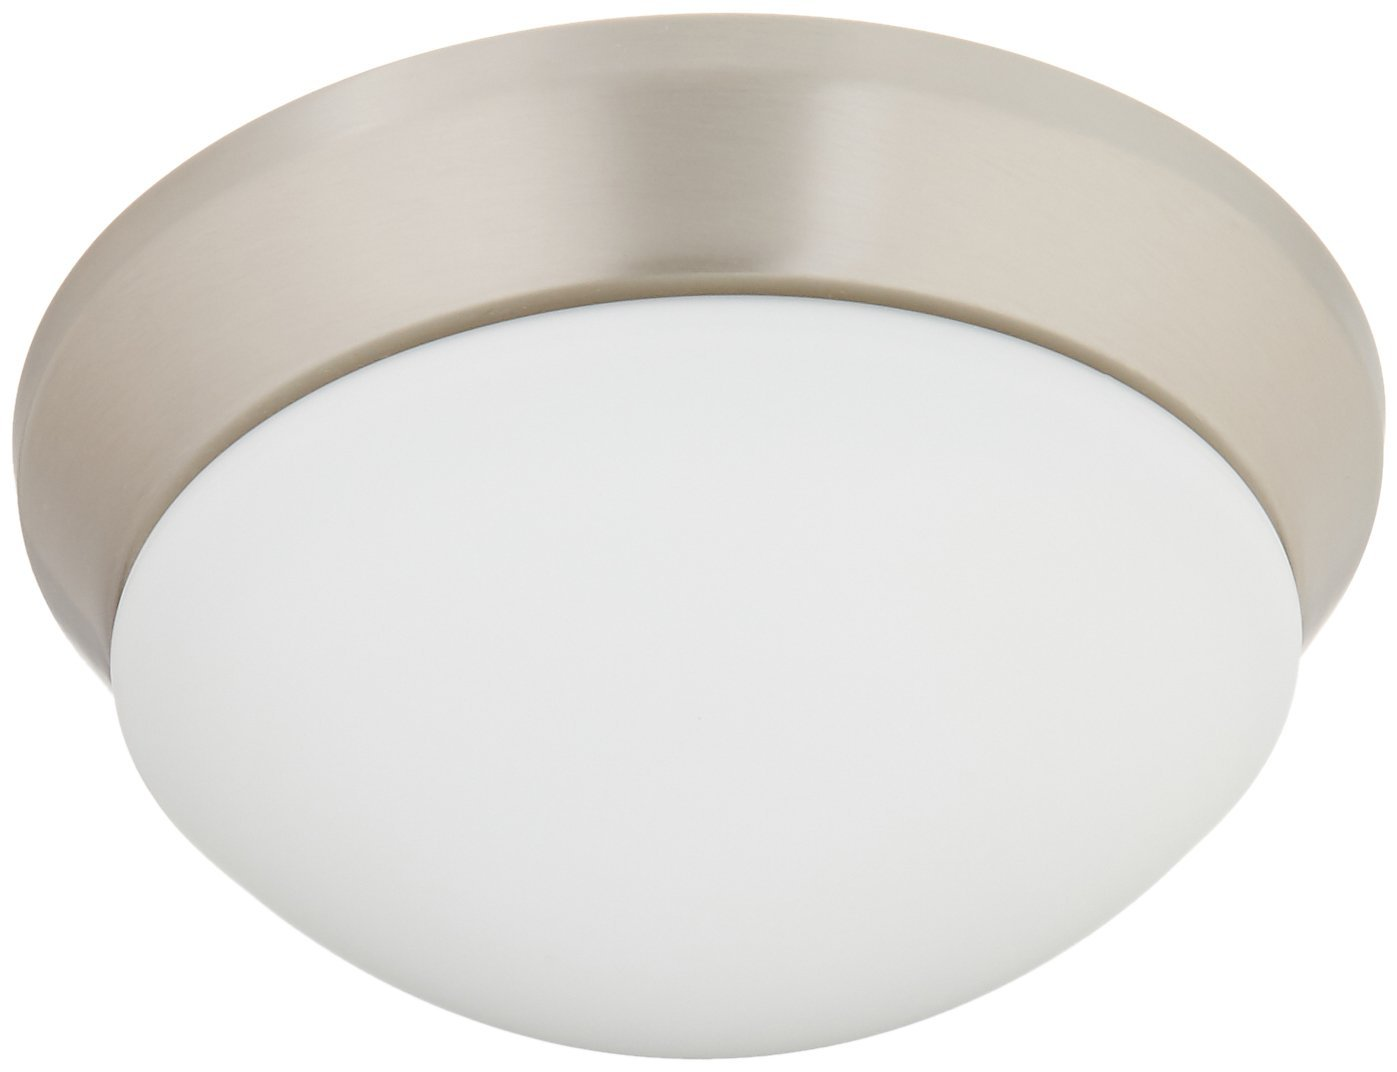 Kichler 8880ni flush mount ceiling lighting round brushed nickel 1 light 10 w x 4 25 h 75 watts close to ceiling light fixtures amazon com